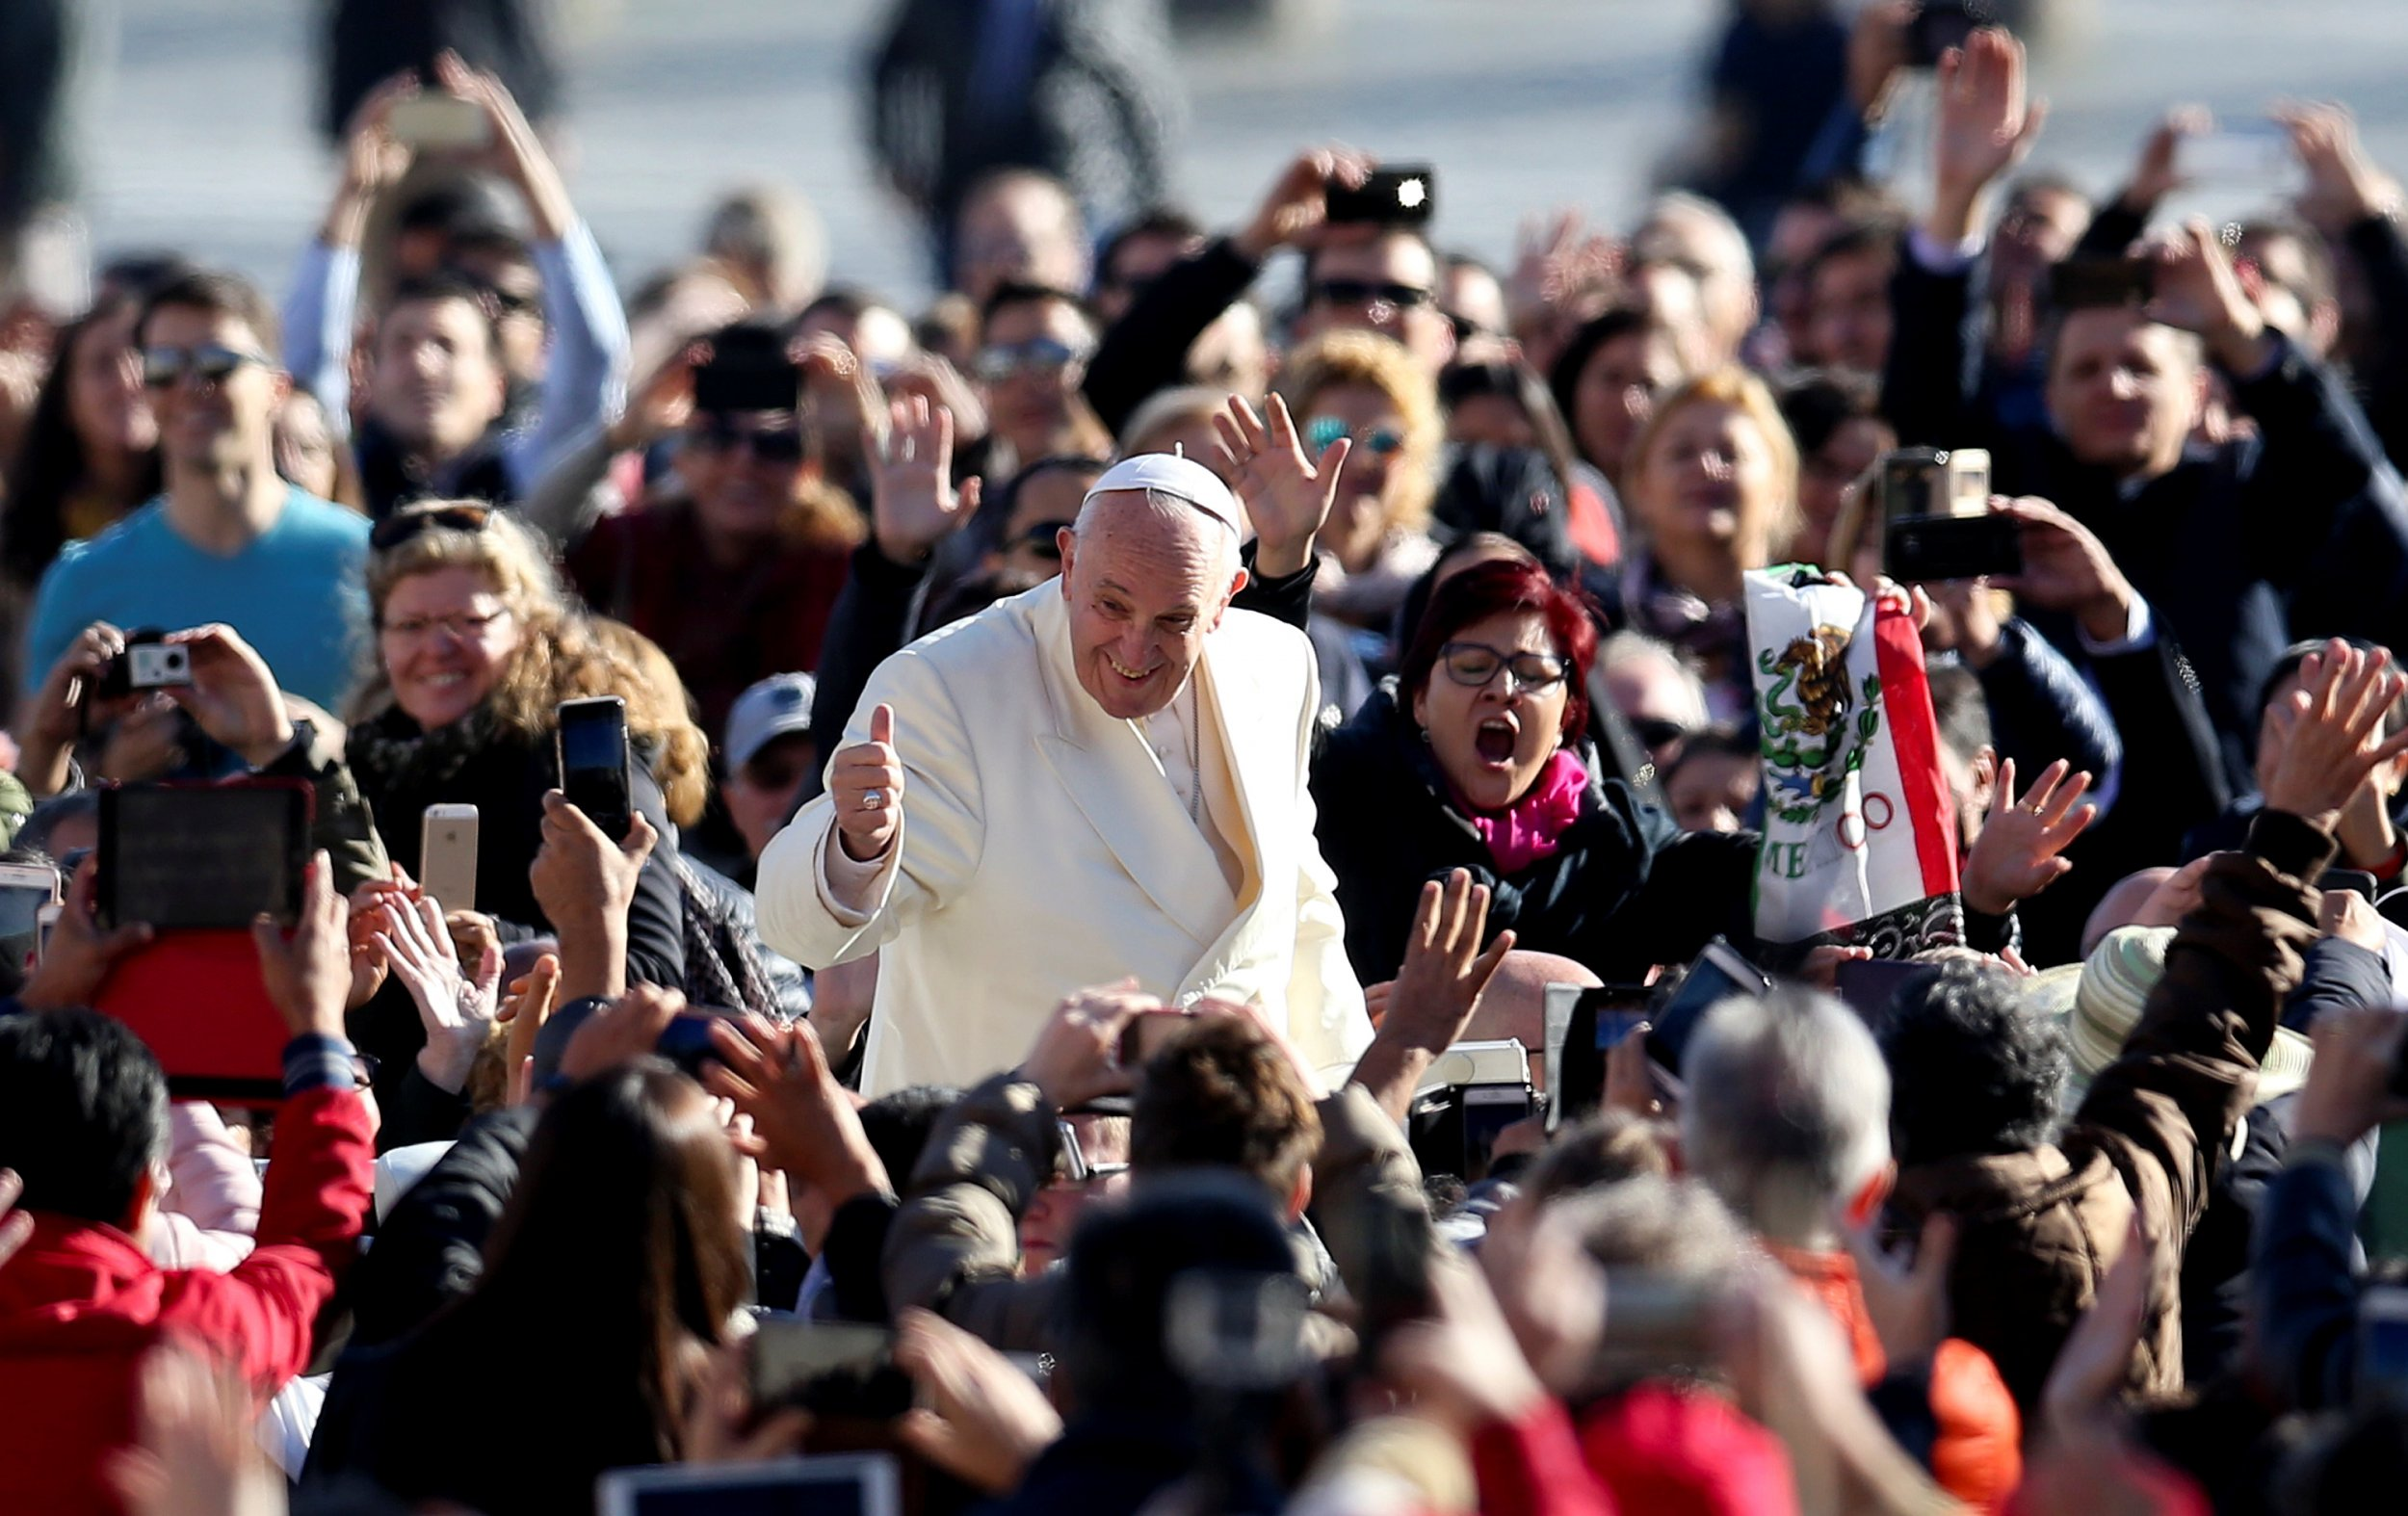 11_08_Pope_Francis_phones